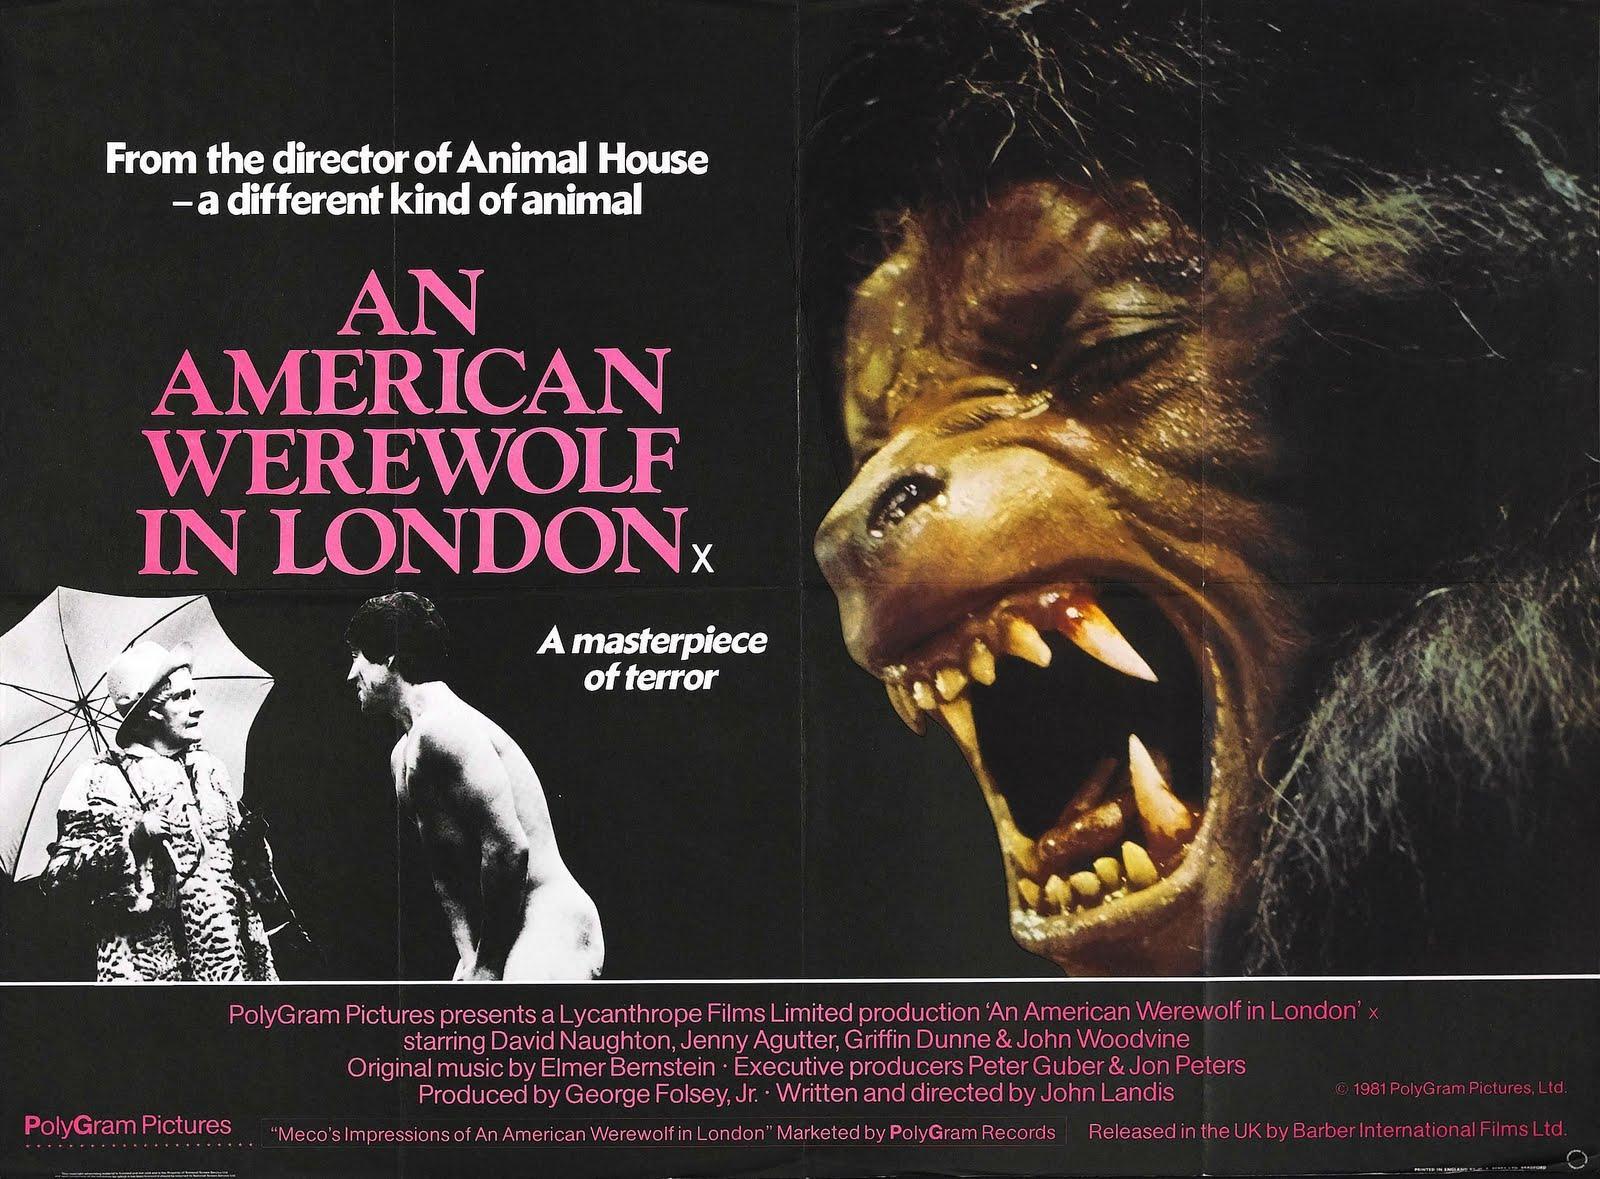 Classic movies an american werewolf in london HQ WALLPAPER   97813 1600x1179